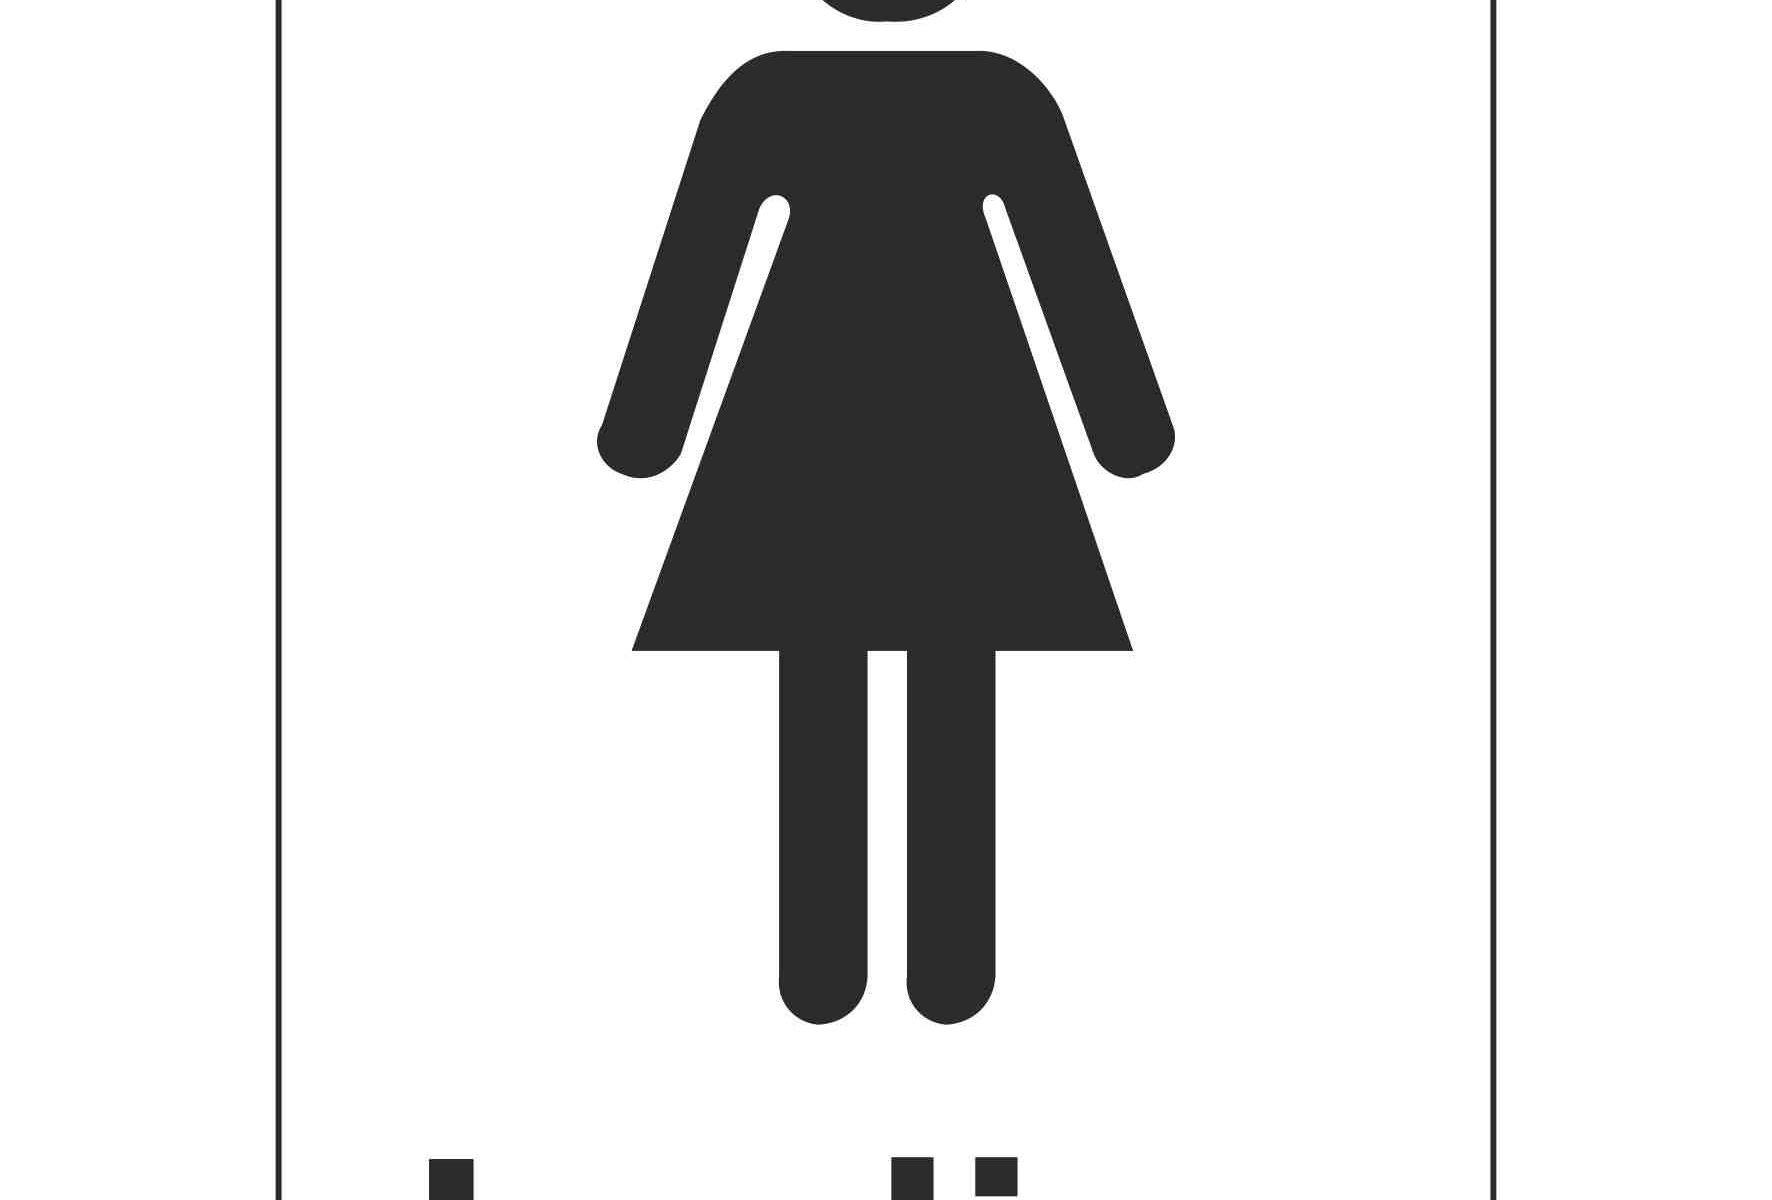 Ladies Toilet (Sticker)